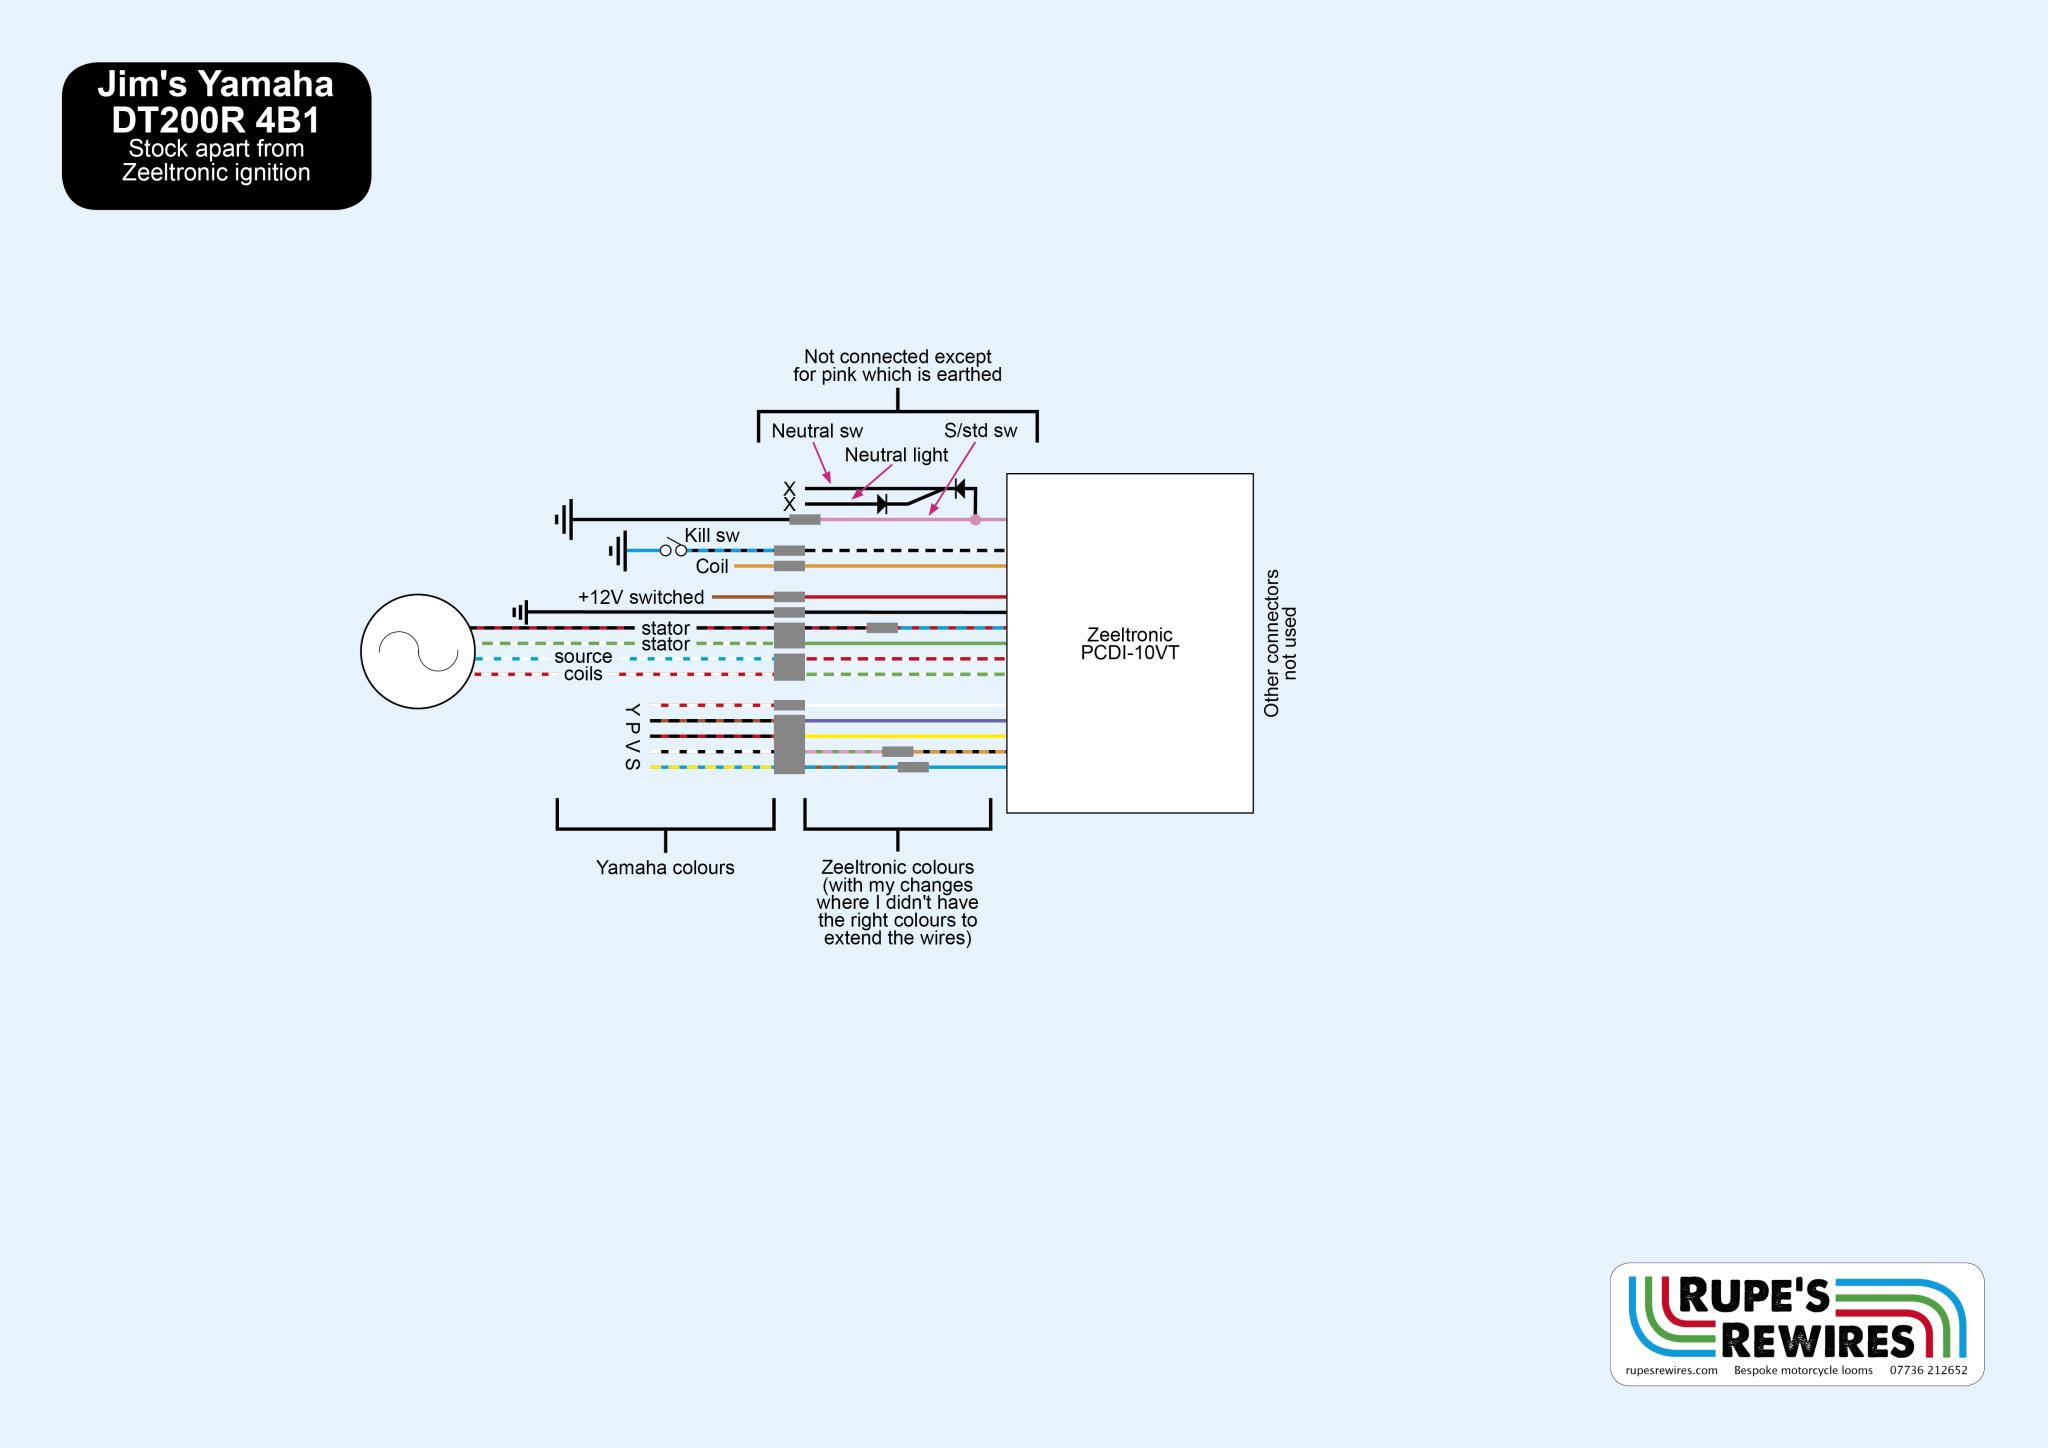 Yamaha Dt200r Wiring Diagram : Yamaha dt r wiring diagram portal